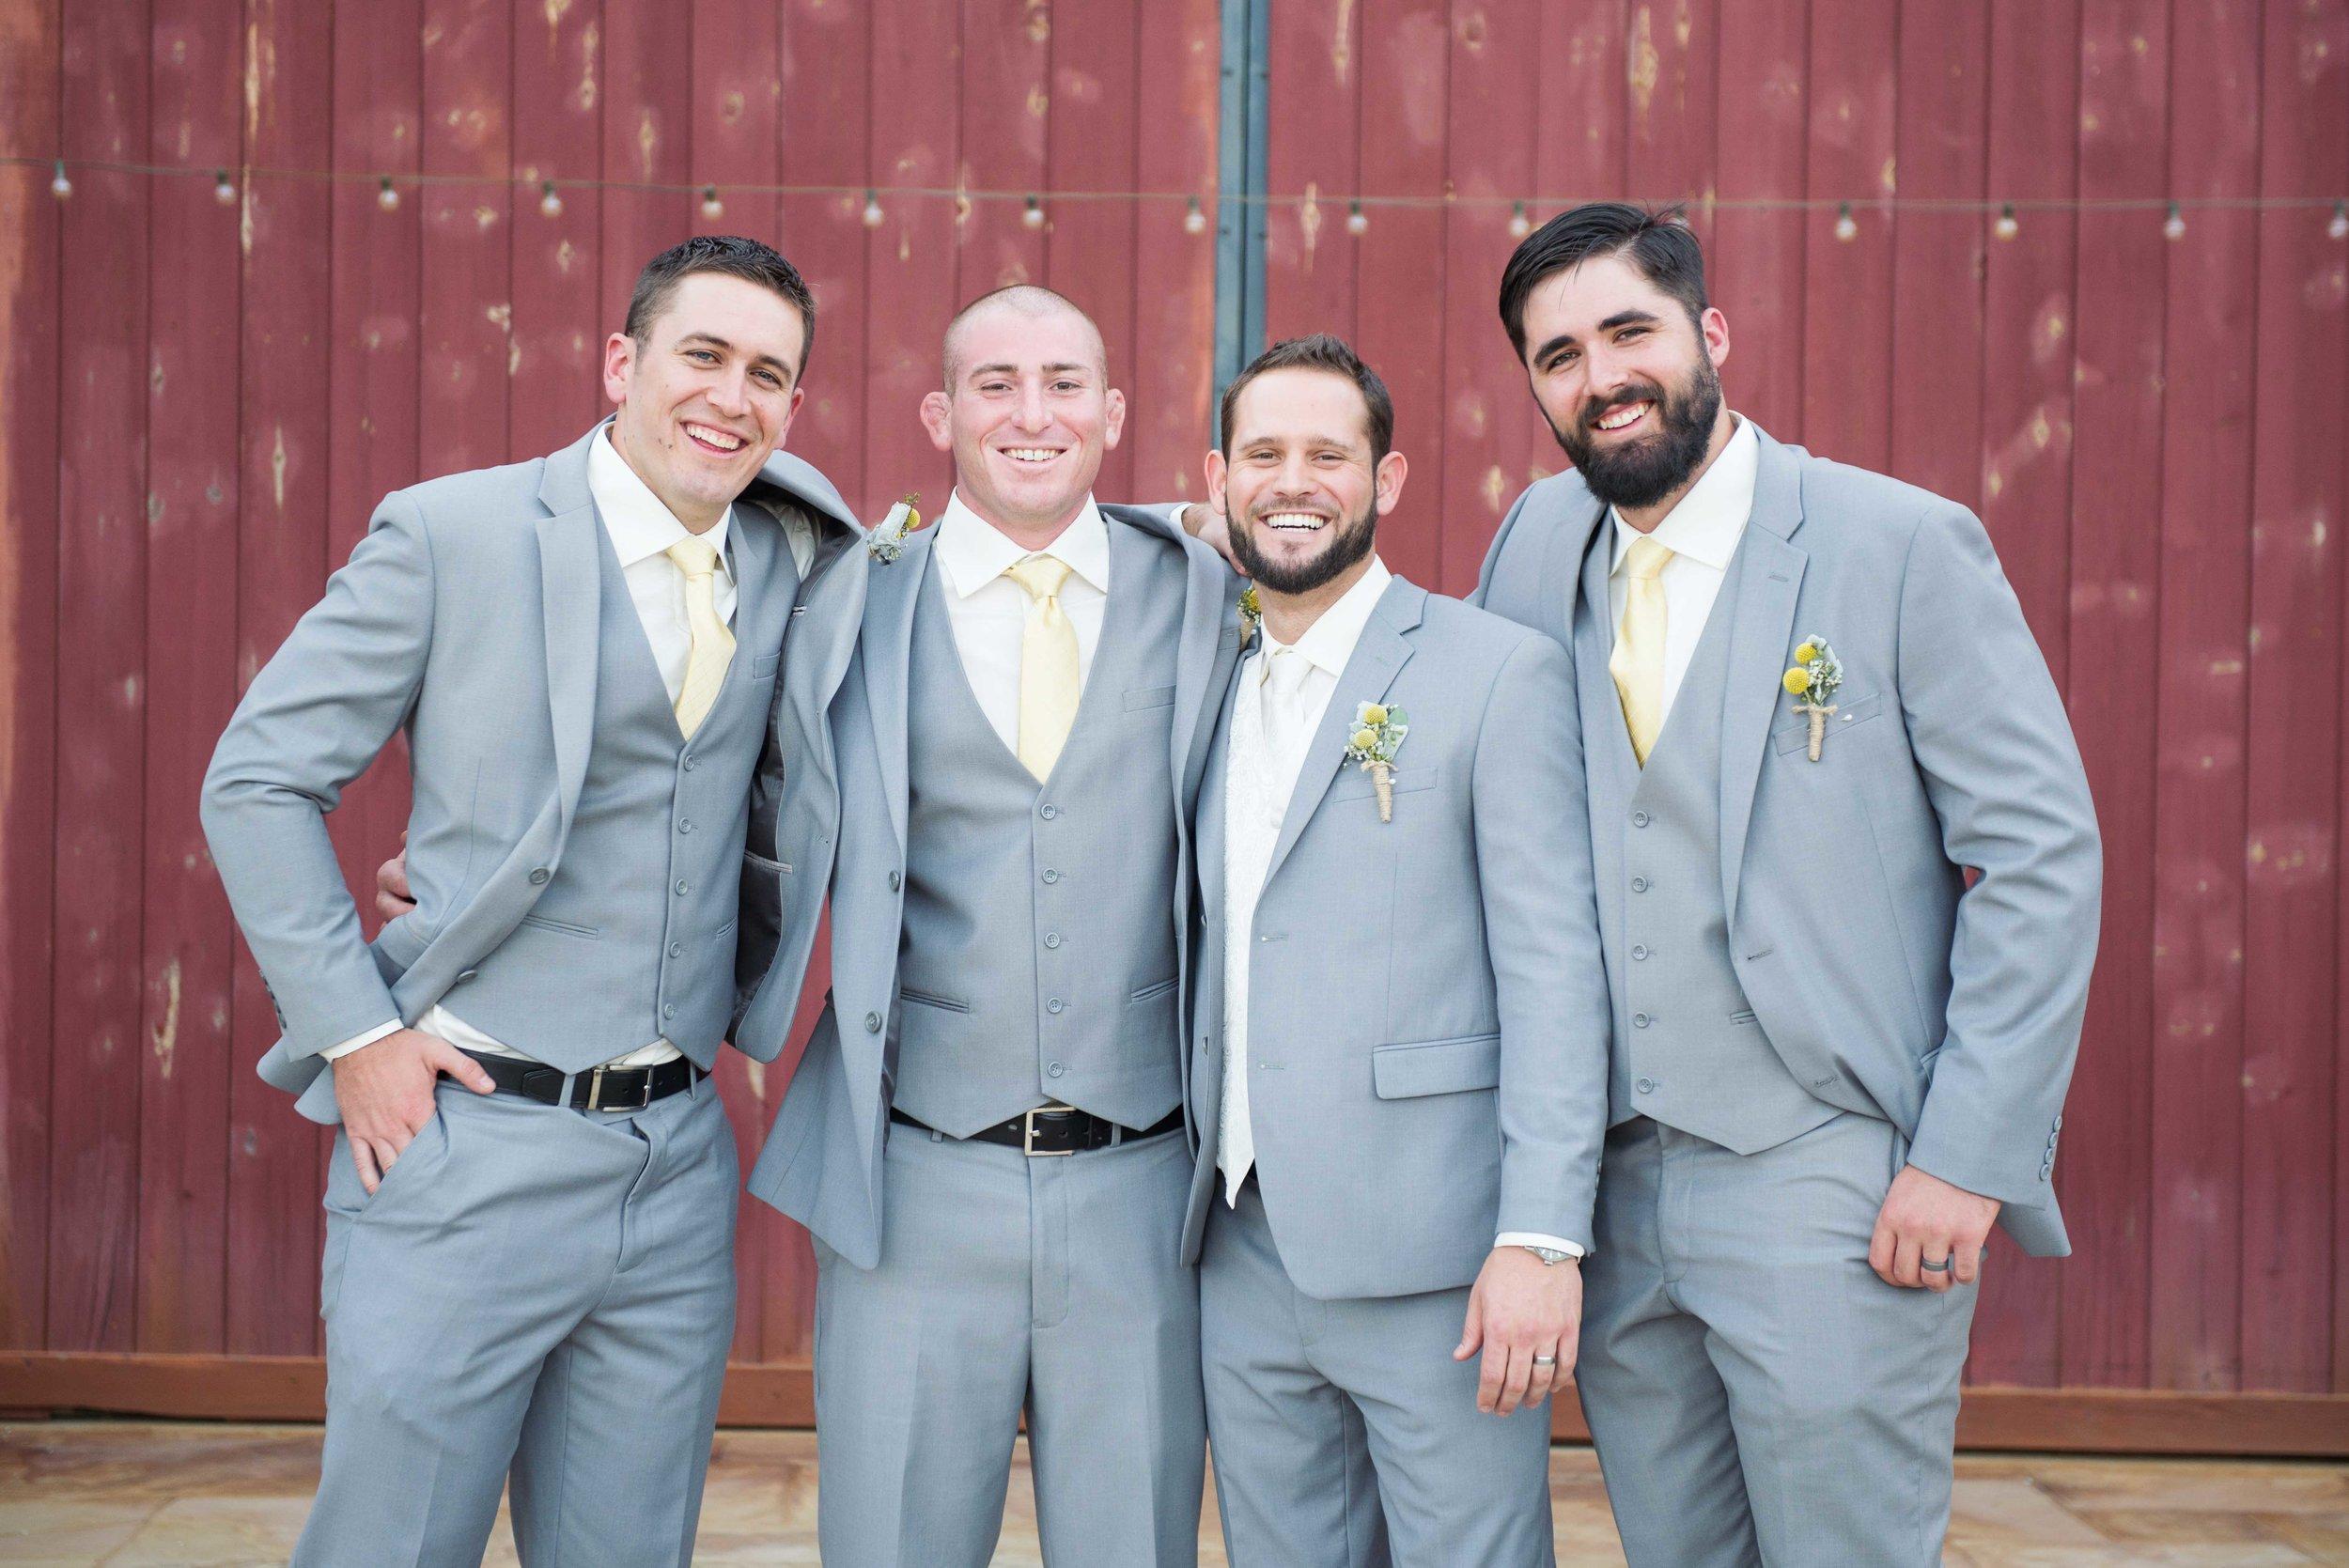 weddingwebsitesmallerpics-100.jpg